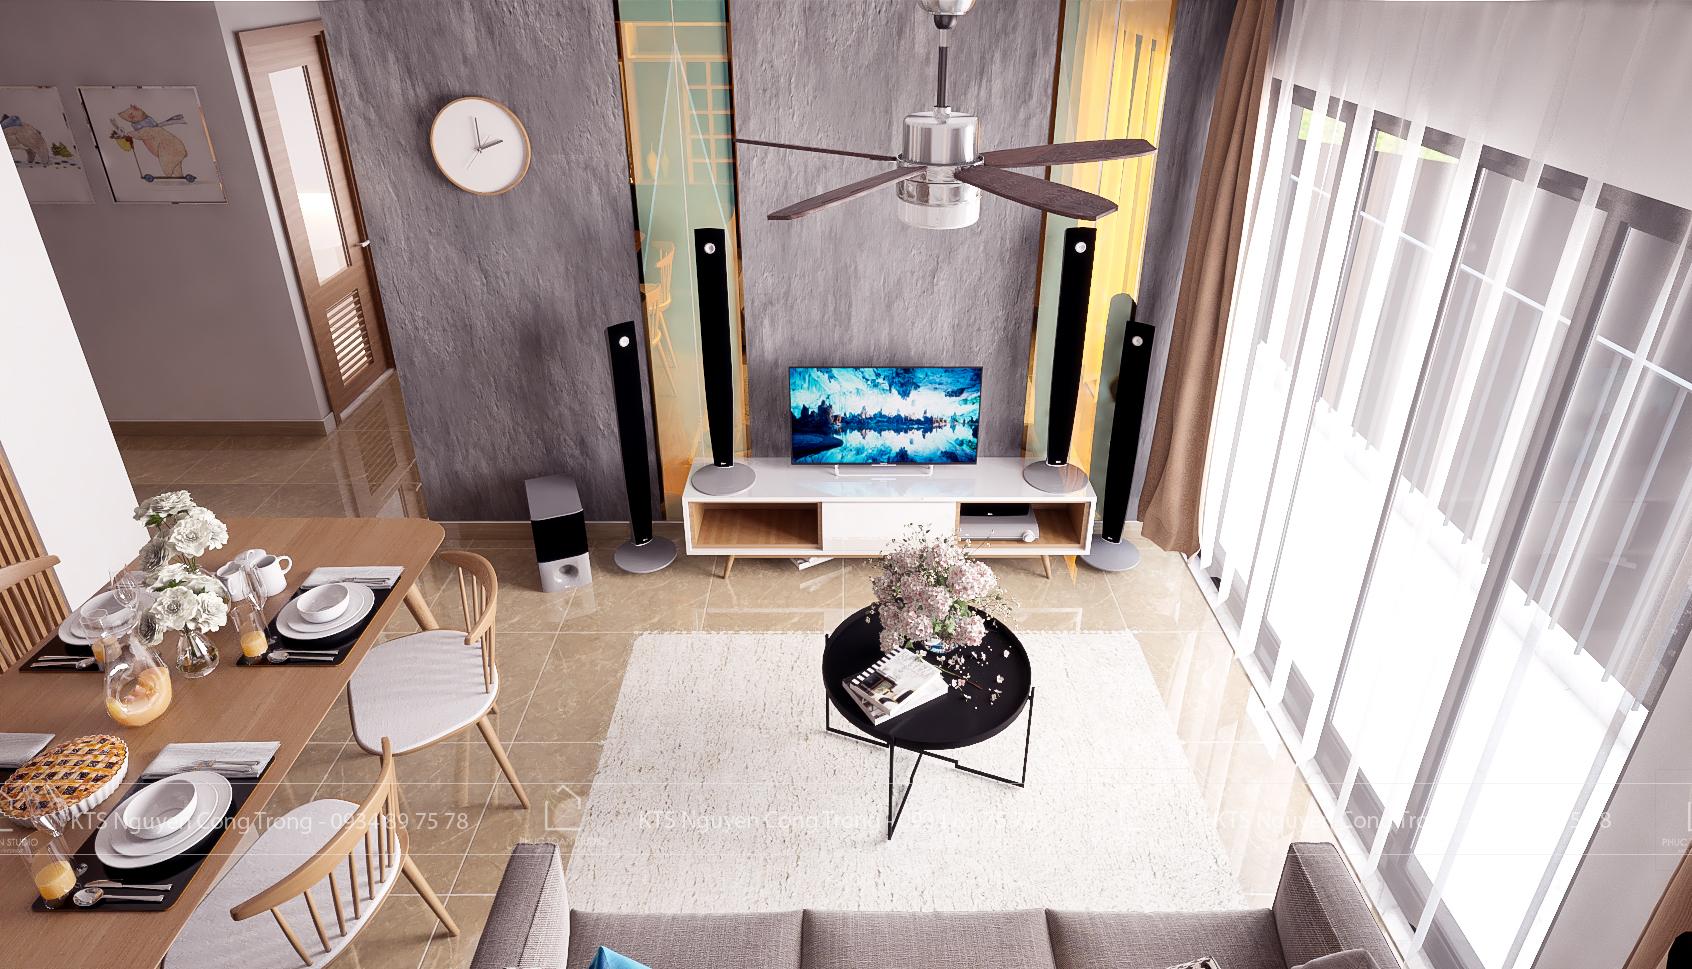 thiet-ke-noi-that-chung-cu-gather-apartment51